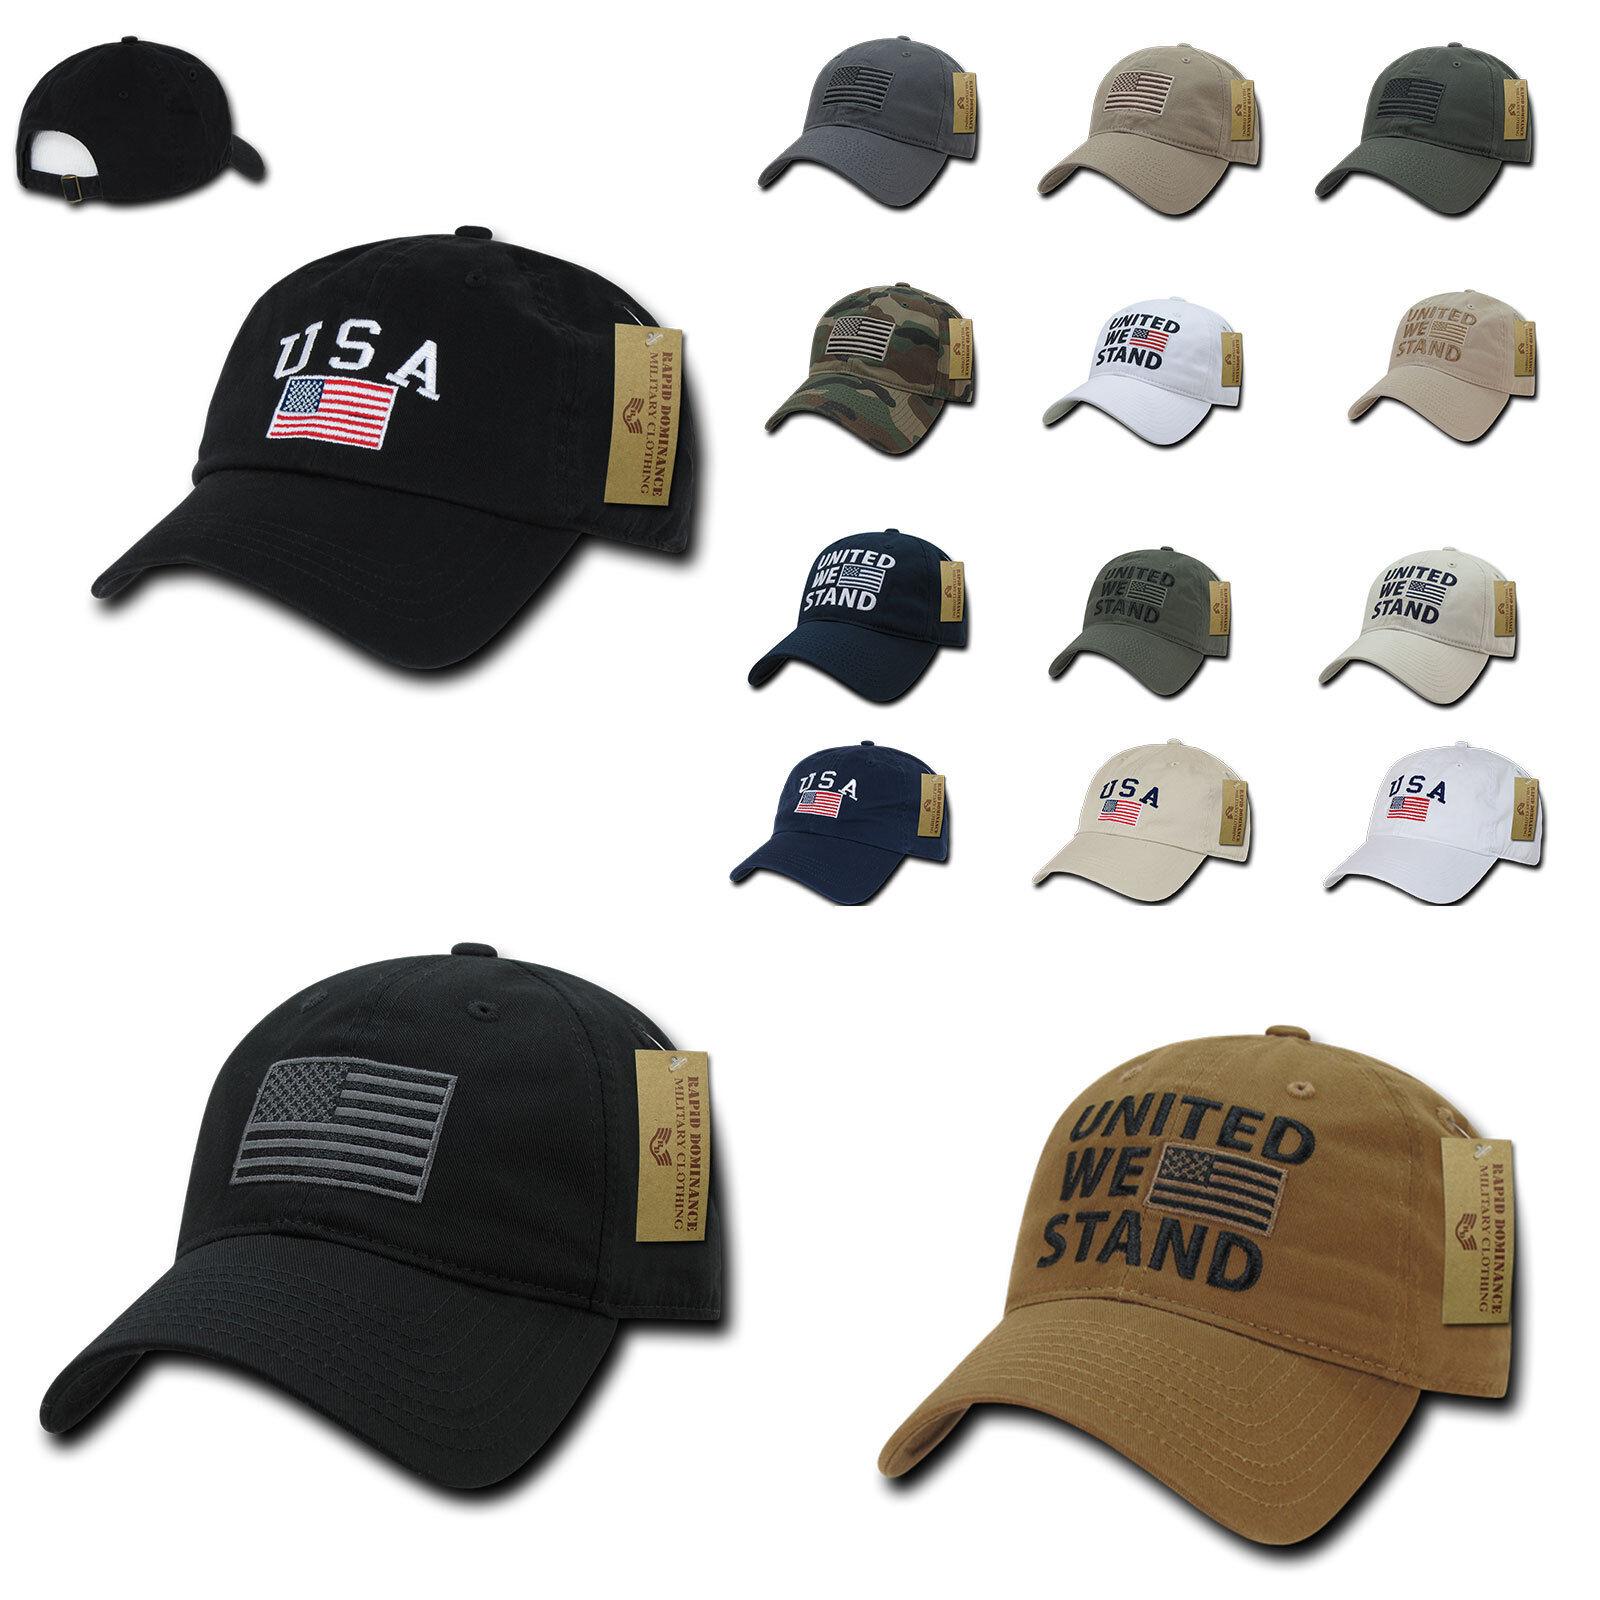 2cbdc099b7bb2 Rapid Dominance Patriotic USA American Flag Baseball Cotton